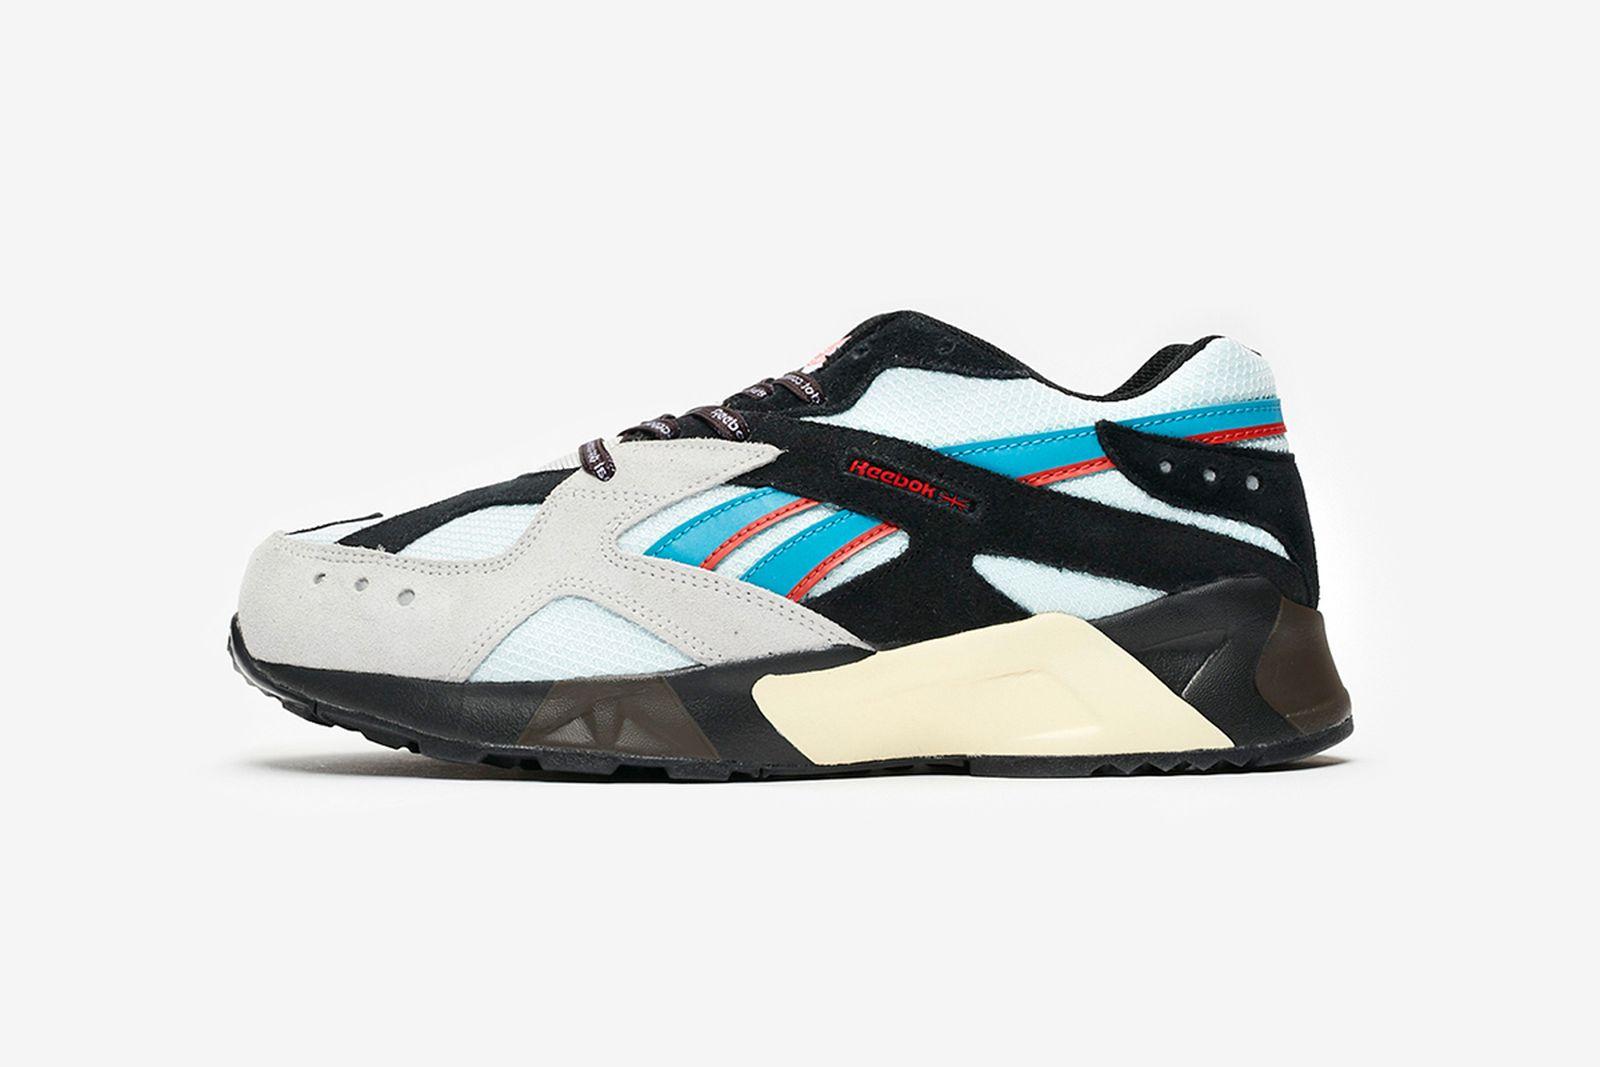 mita reebok aztrek release date price bal mita sneakers